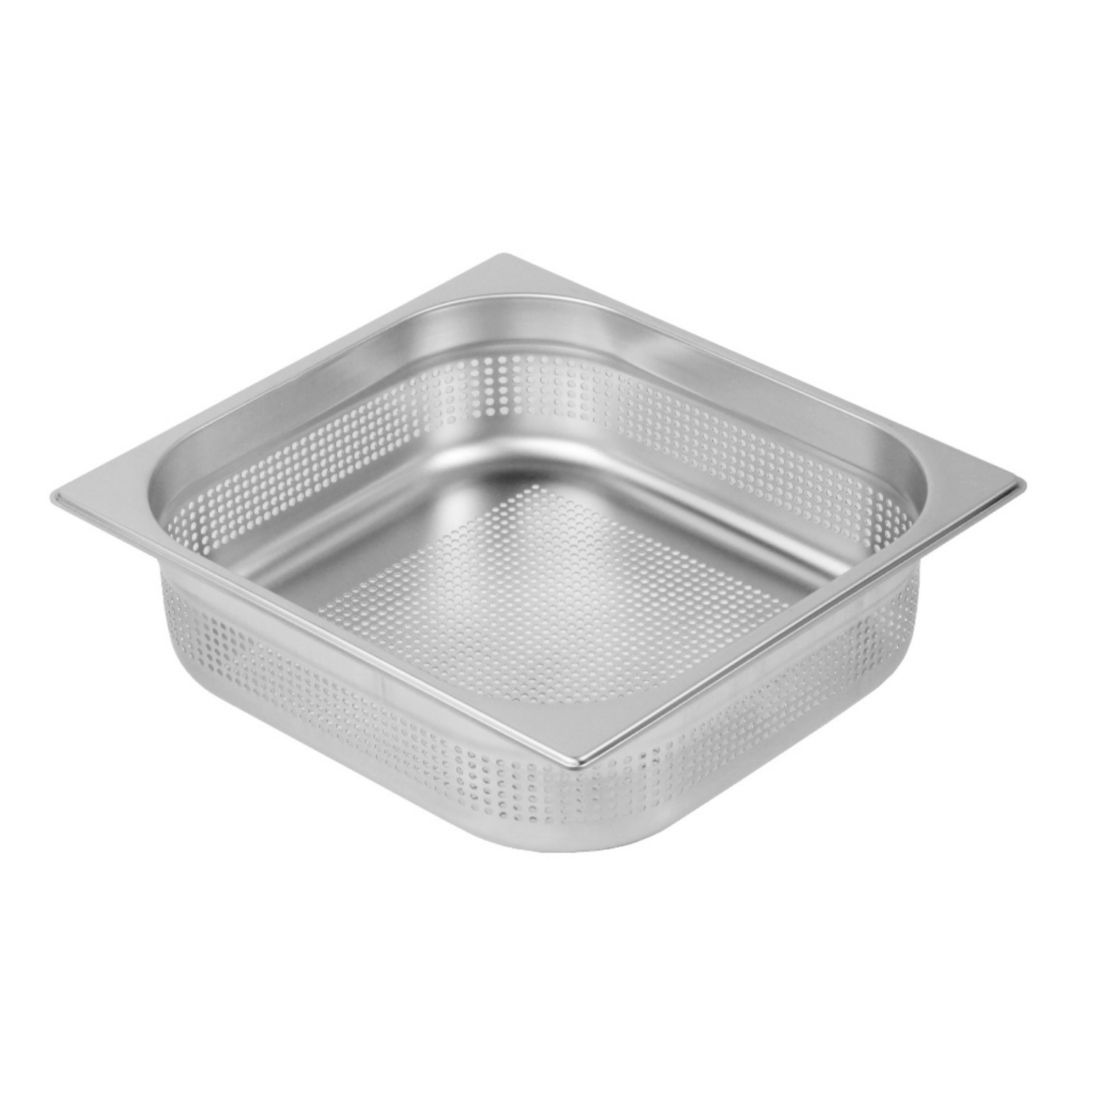 Gastronádoba Profi děrovaná GN 2/3 150 mm